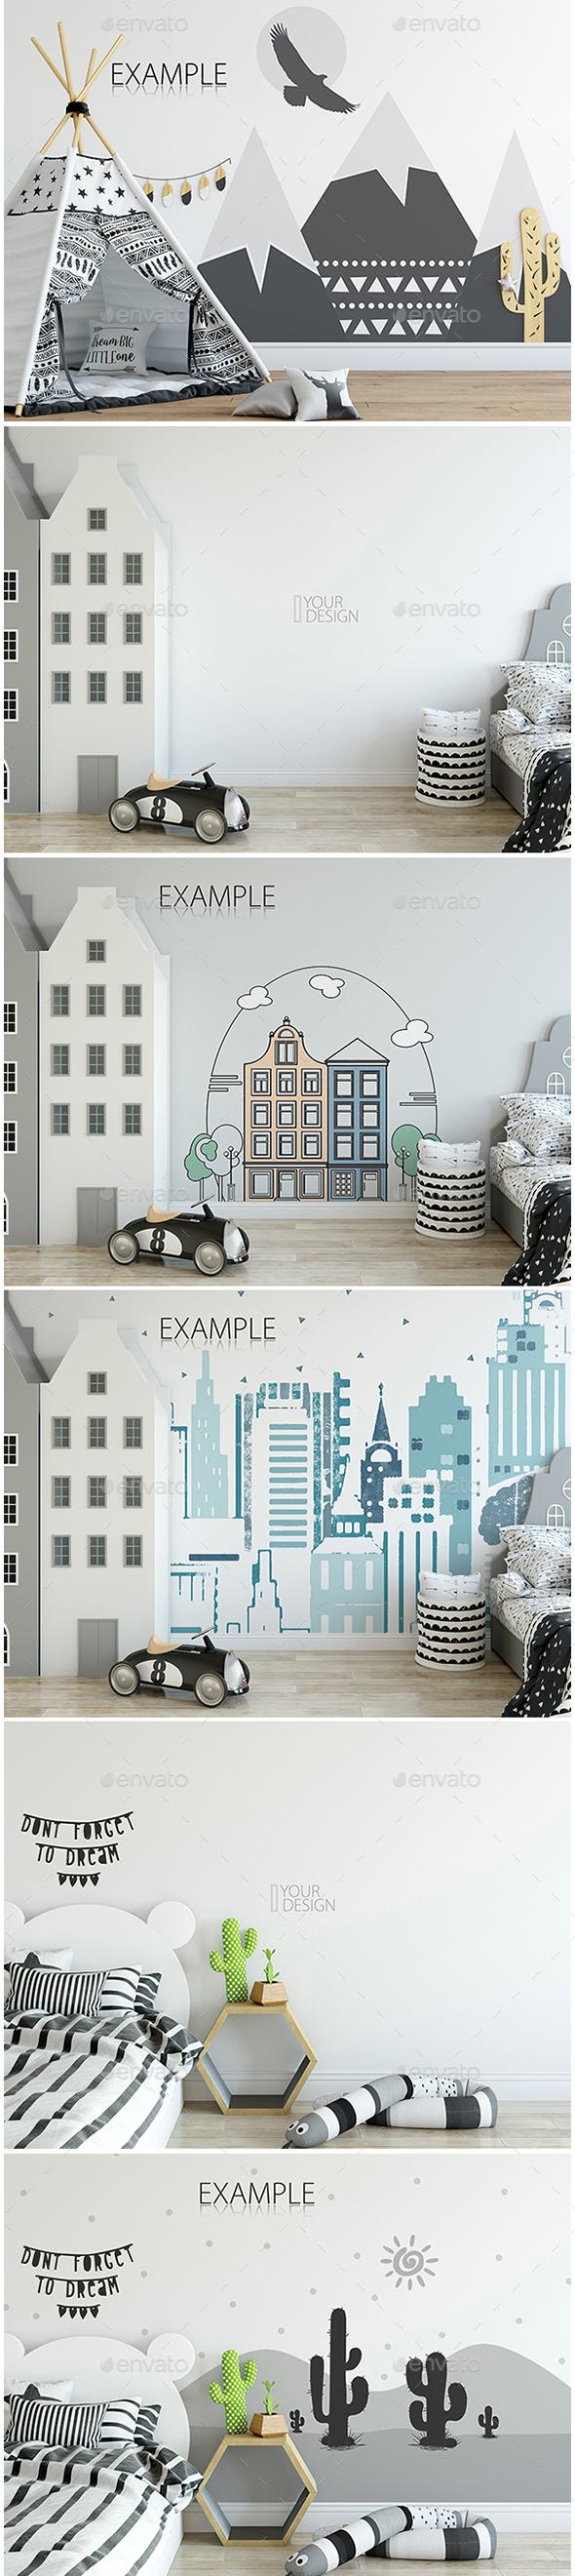 36+ Best Decor Wall Art Mockups (PSD) | Free & Premium Download